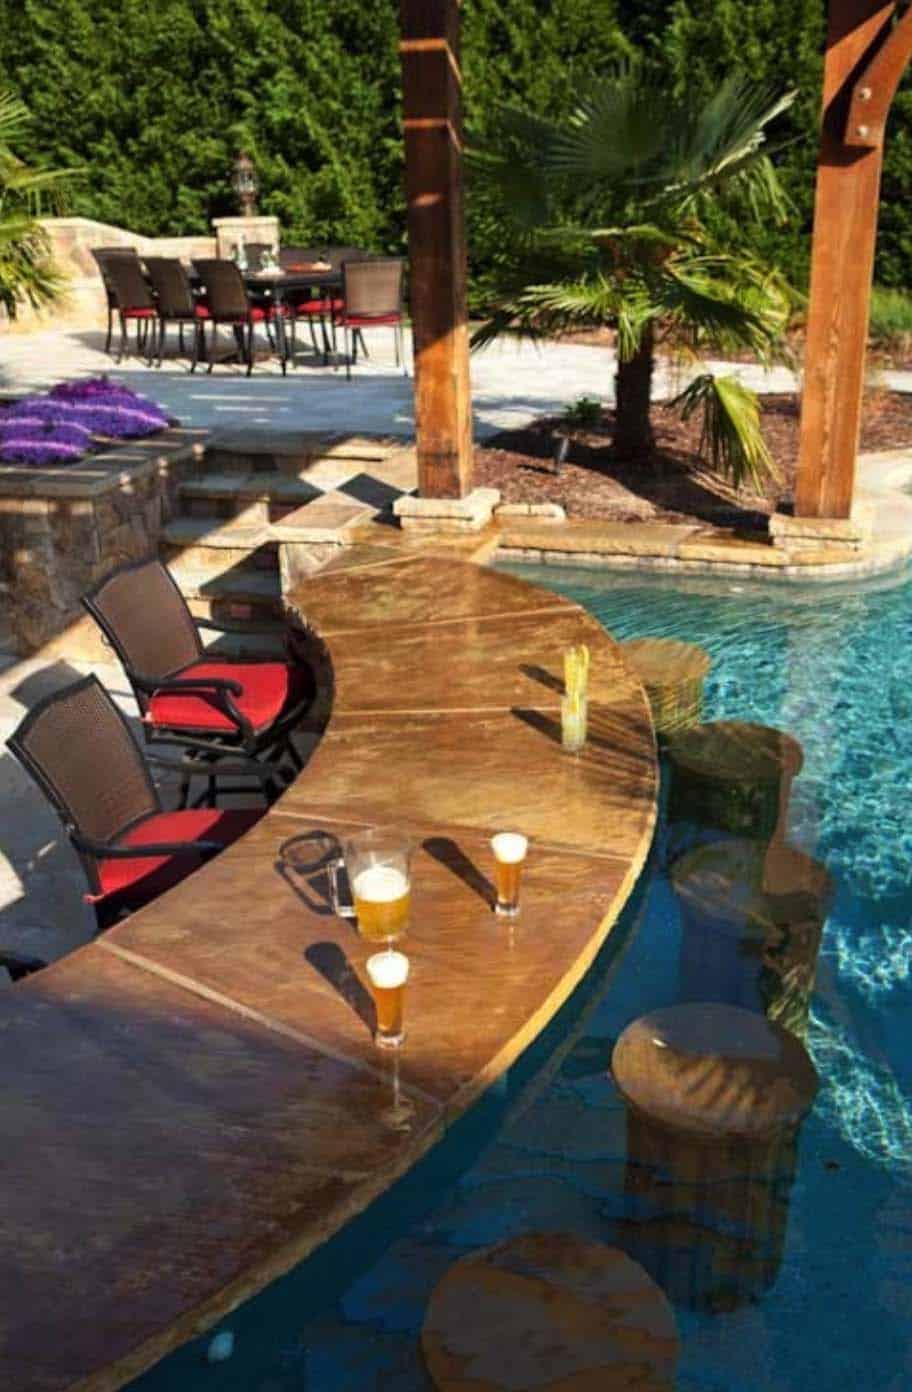 33 Mega-Impressive swim-up pool bars built for entertaining on Backyard Pool Bar Designs  id=16501